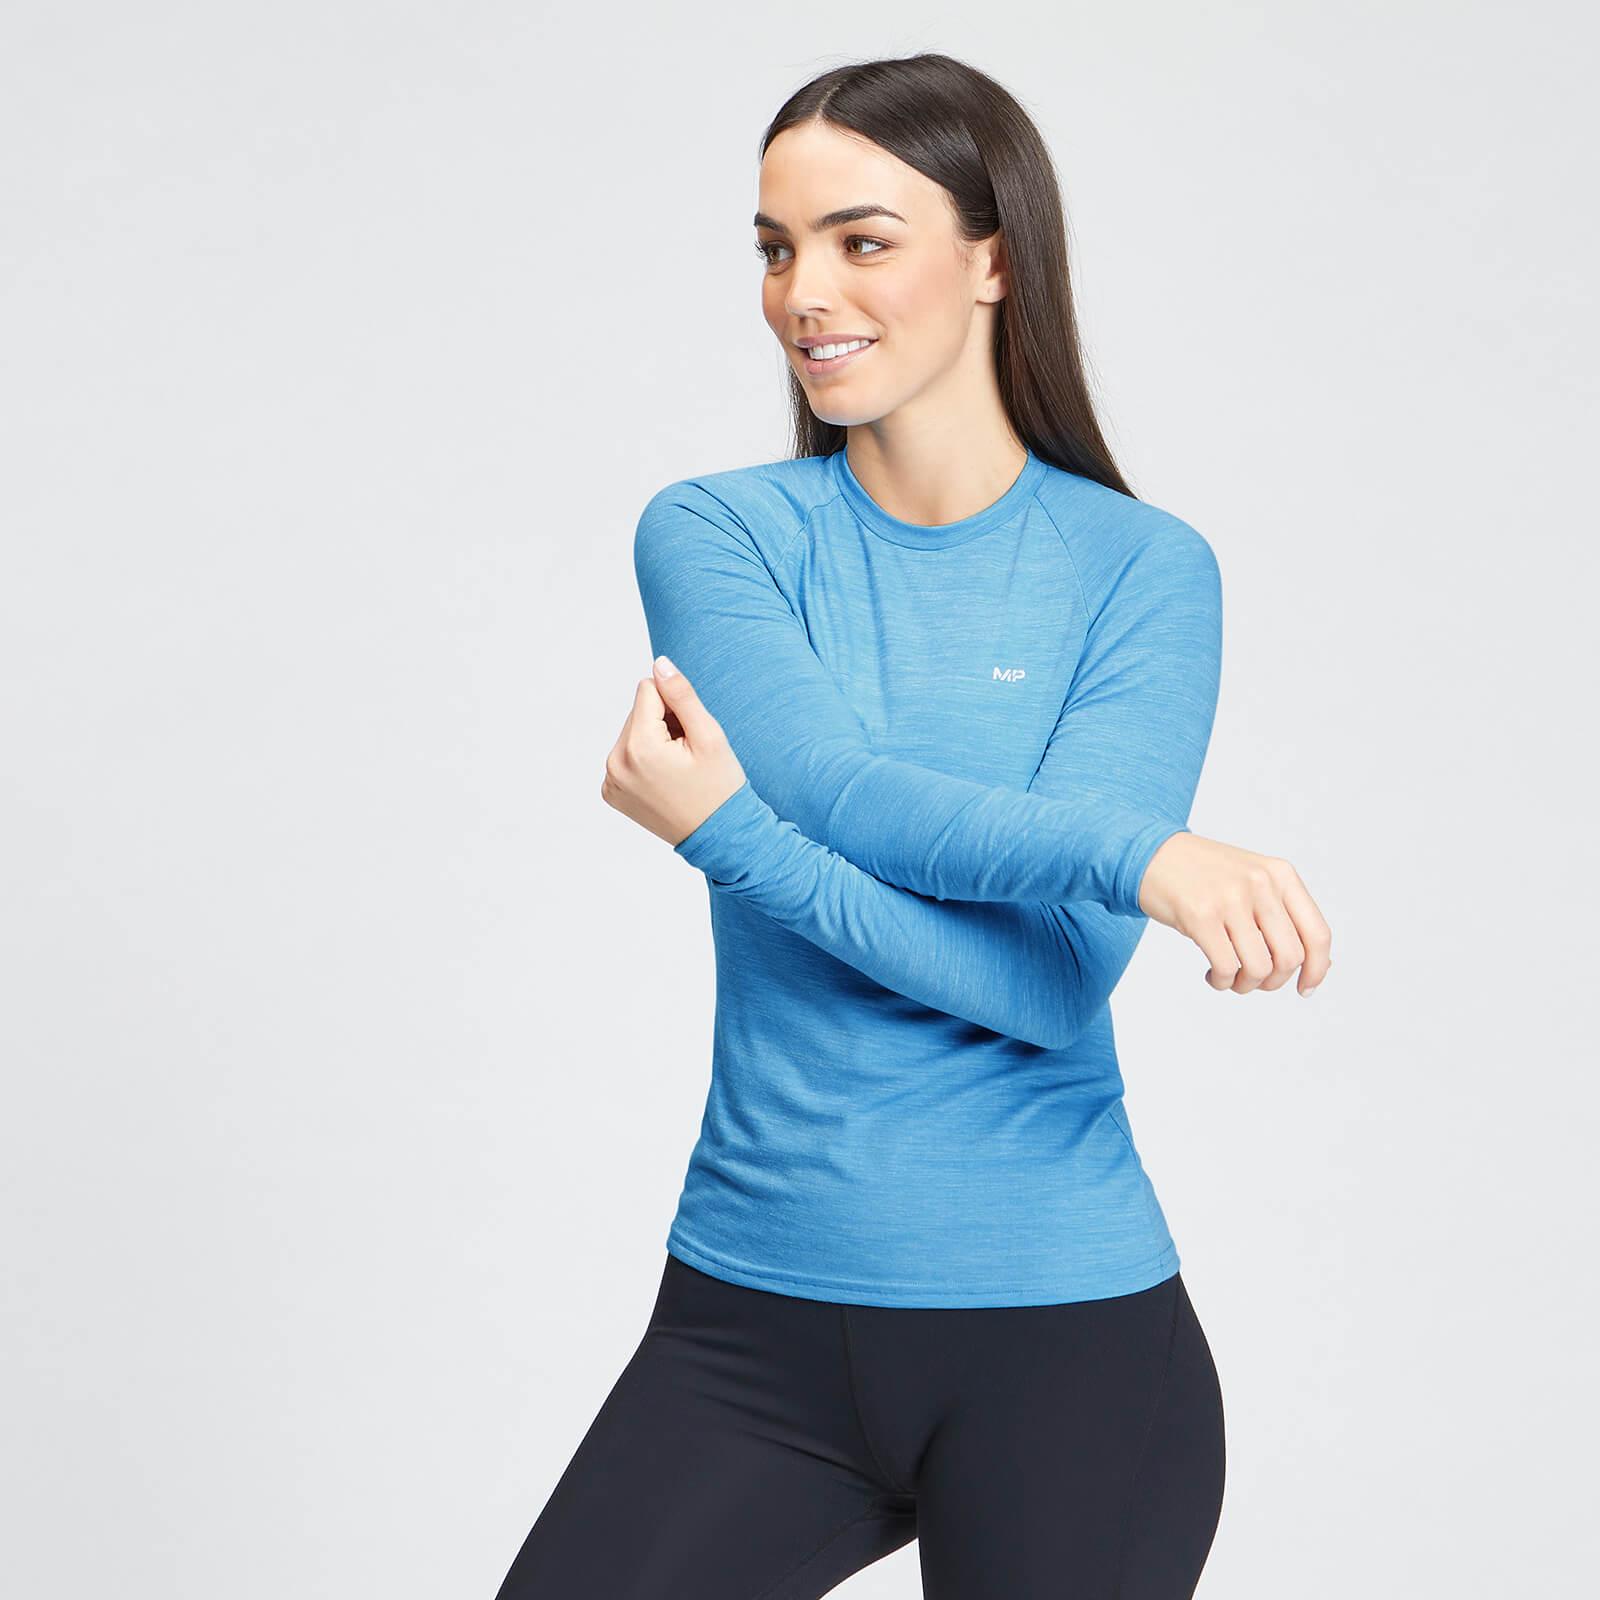 Купить MP Women's Performance Long Sleeve Training T-Shirt - Bright Blue Marl with White Fleck - XL, Myprotein International